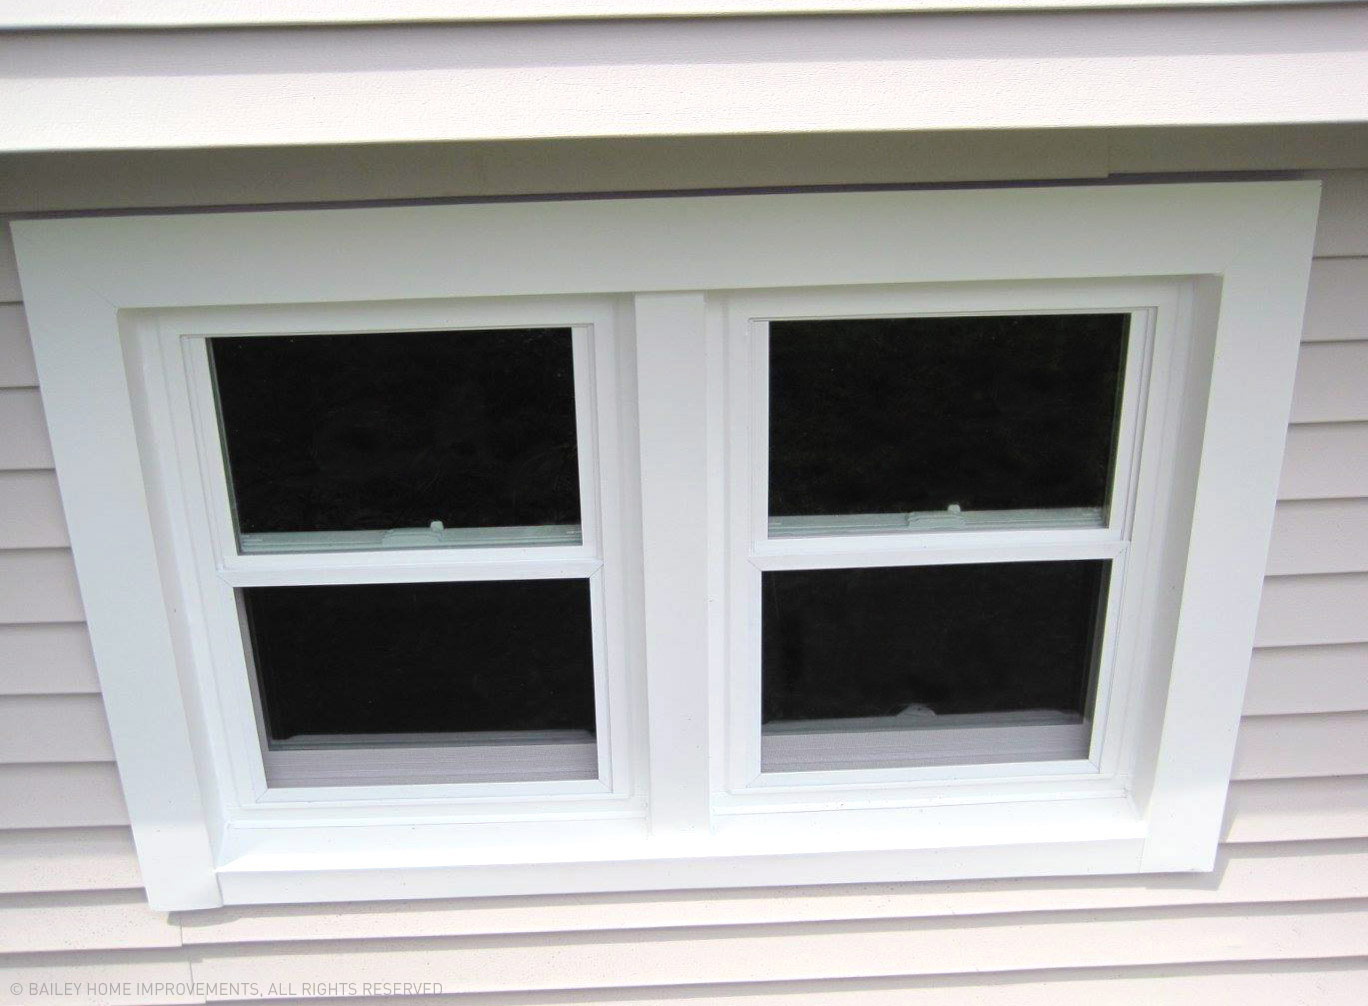 Garden Level Windows by Bailey Home Improvements